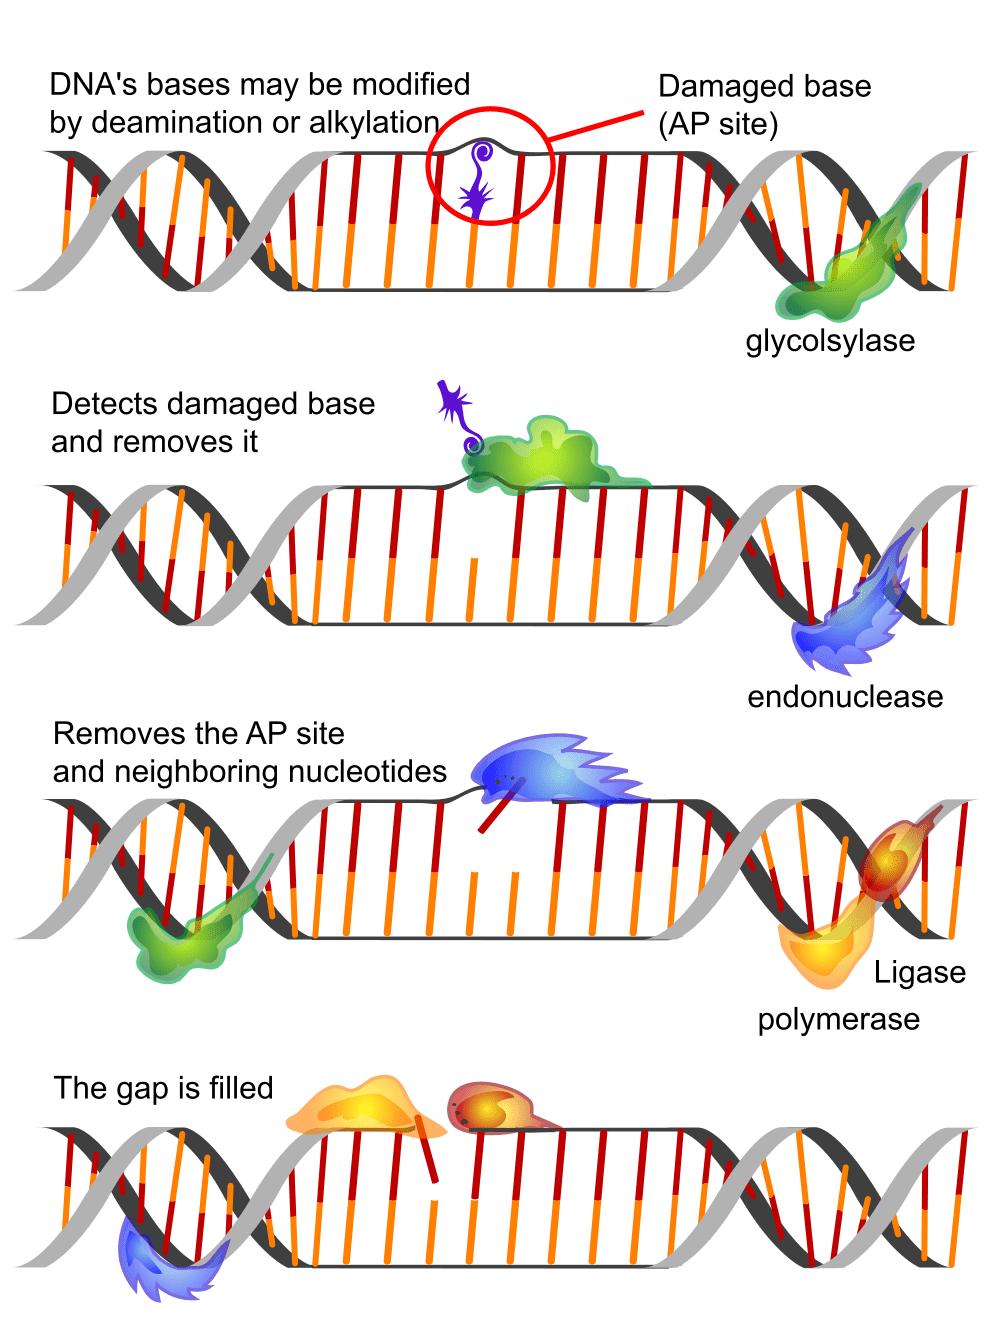 Microfluidic-Molecular machines for DNA repair-The DNAREPAIRMAN Project-2